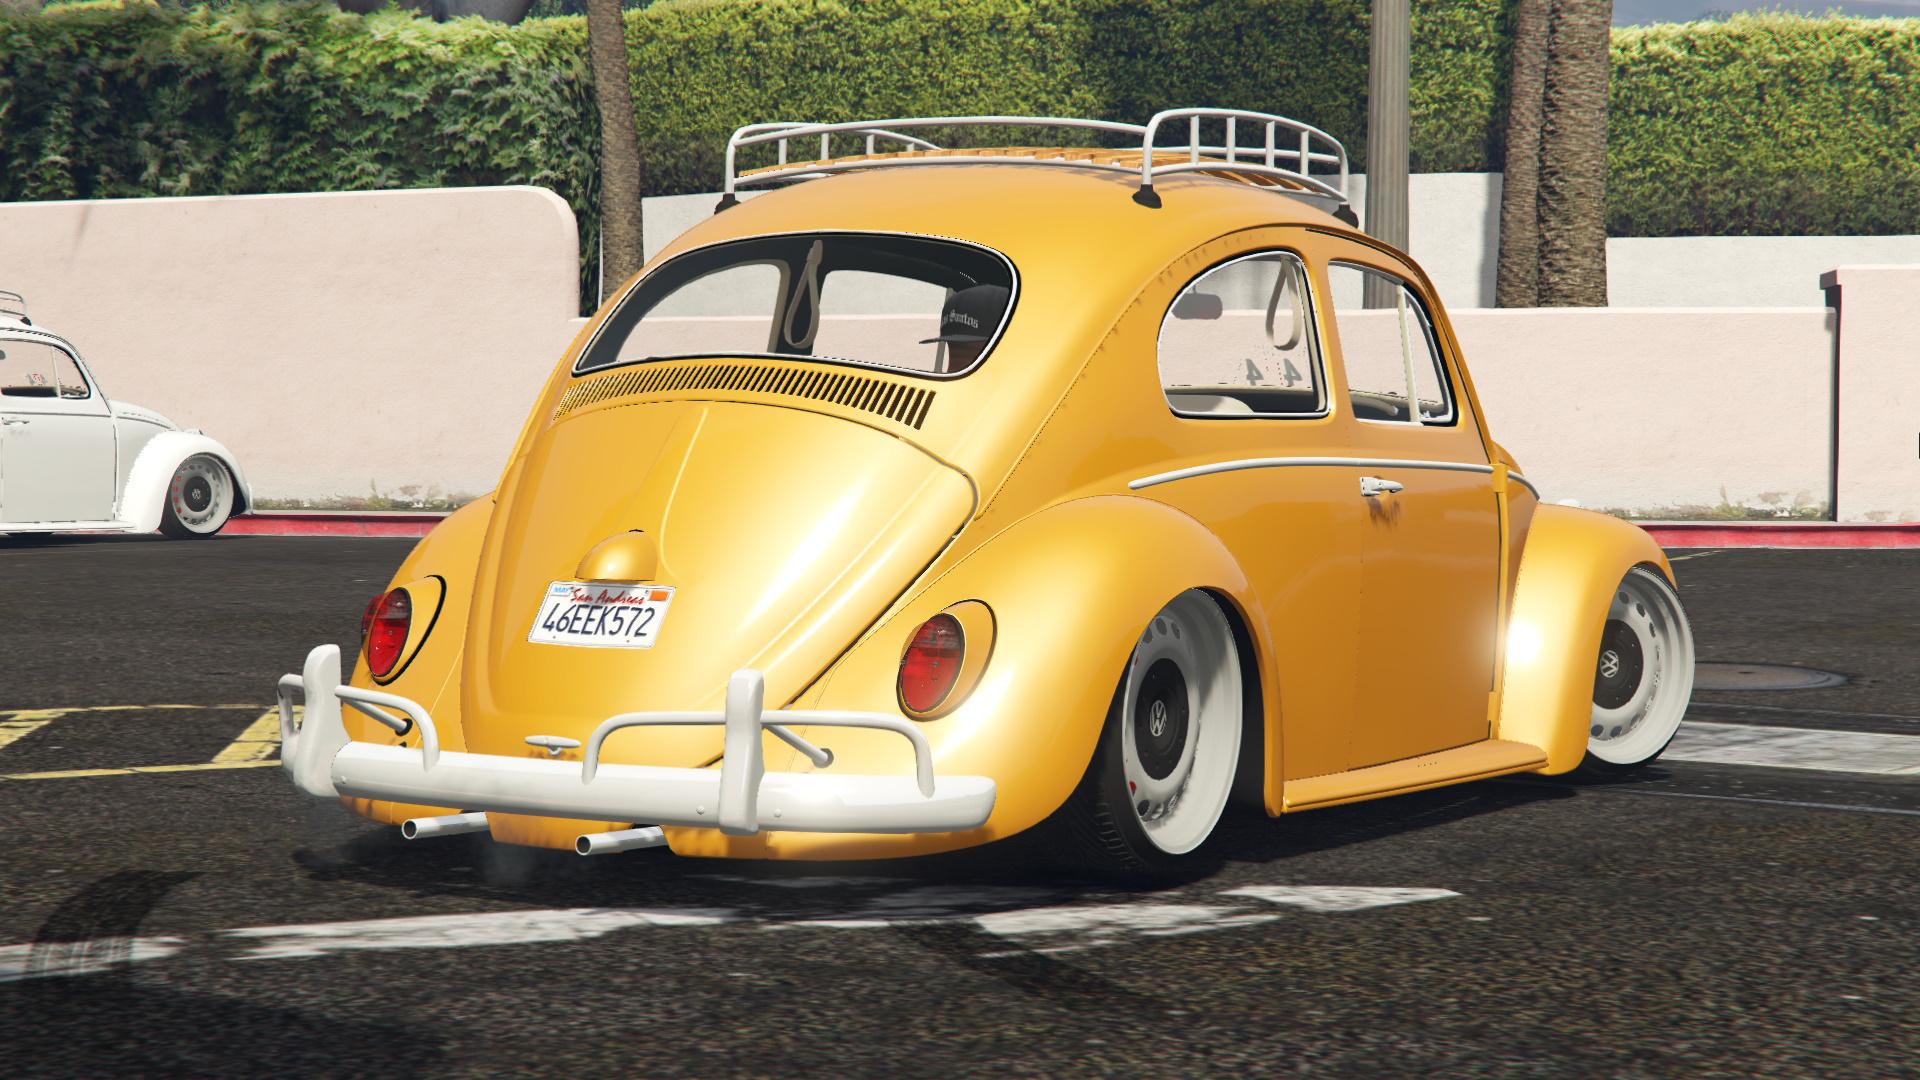 1968 Volkswagen Fusca [Add-On / Replace] - GTA5-Mods.com